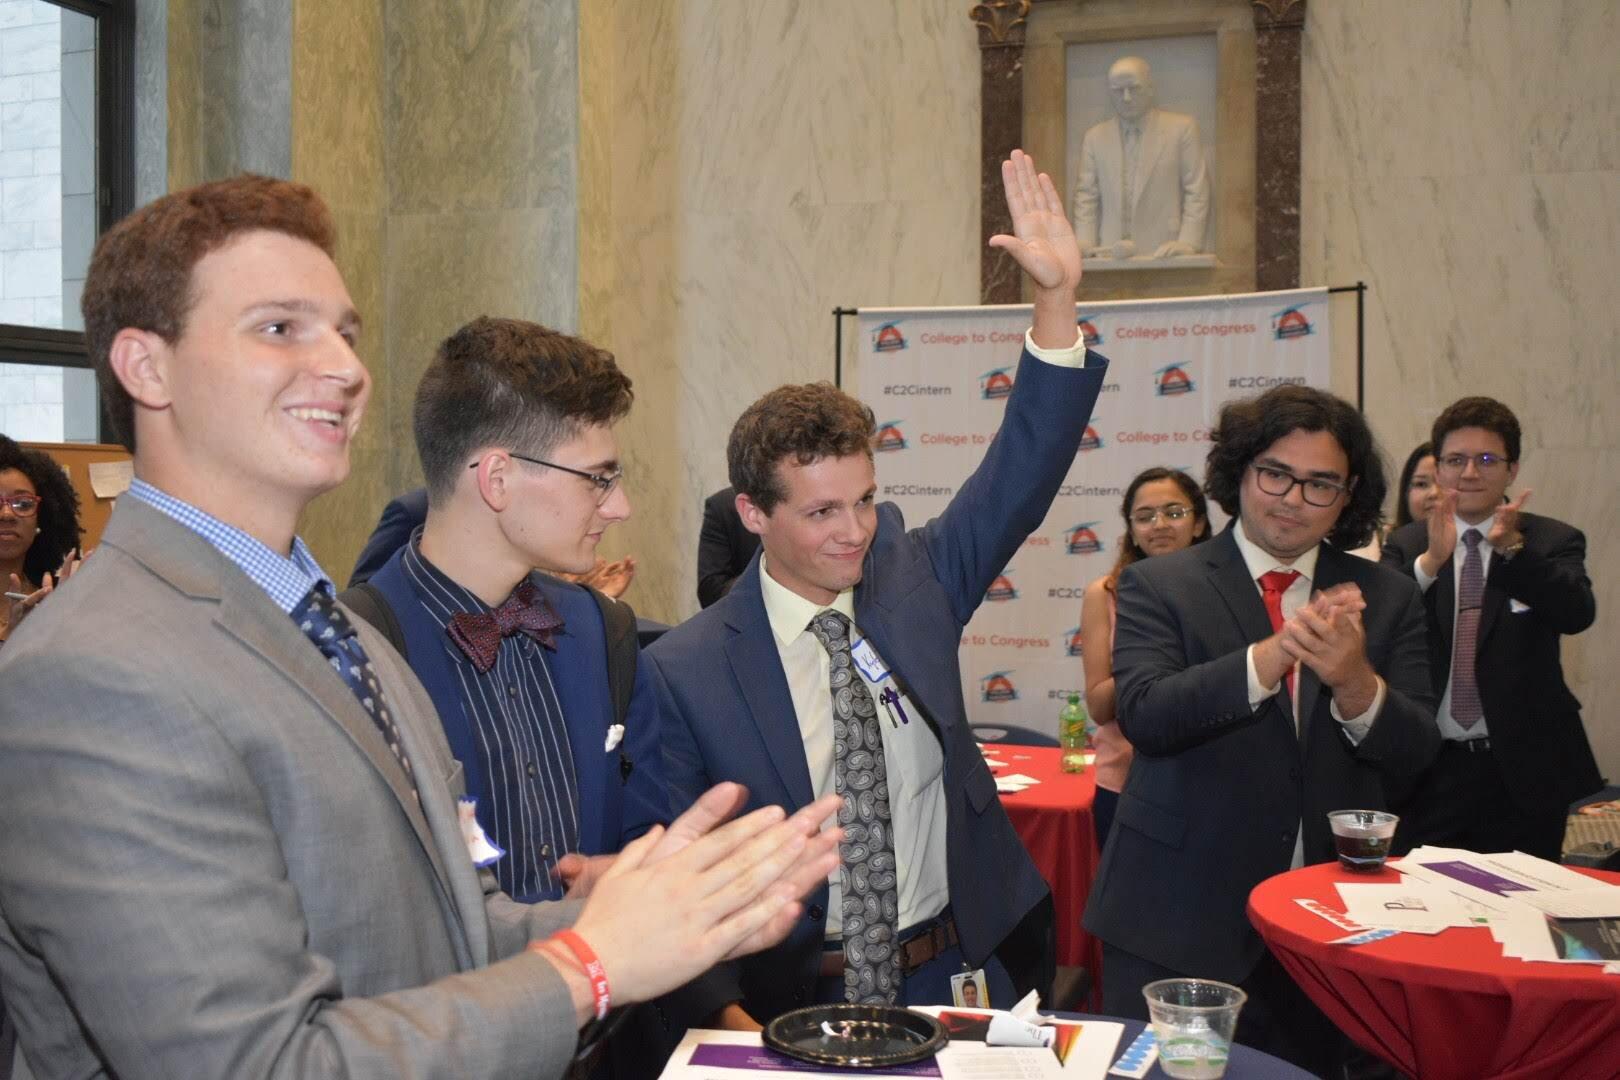 Runner up in Tech App category, Kyle D. (raised hand)